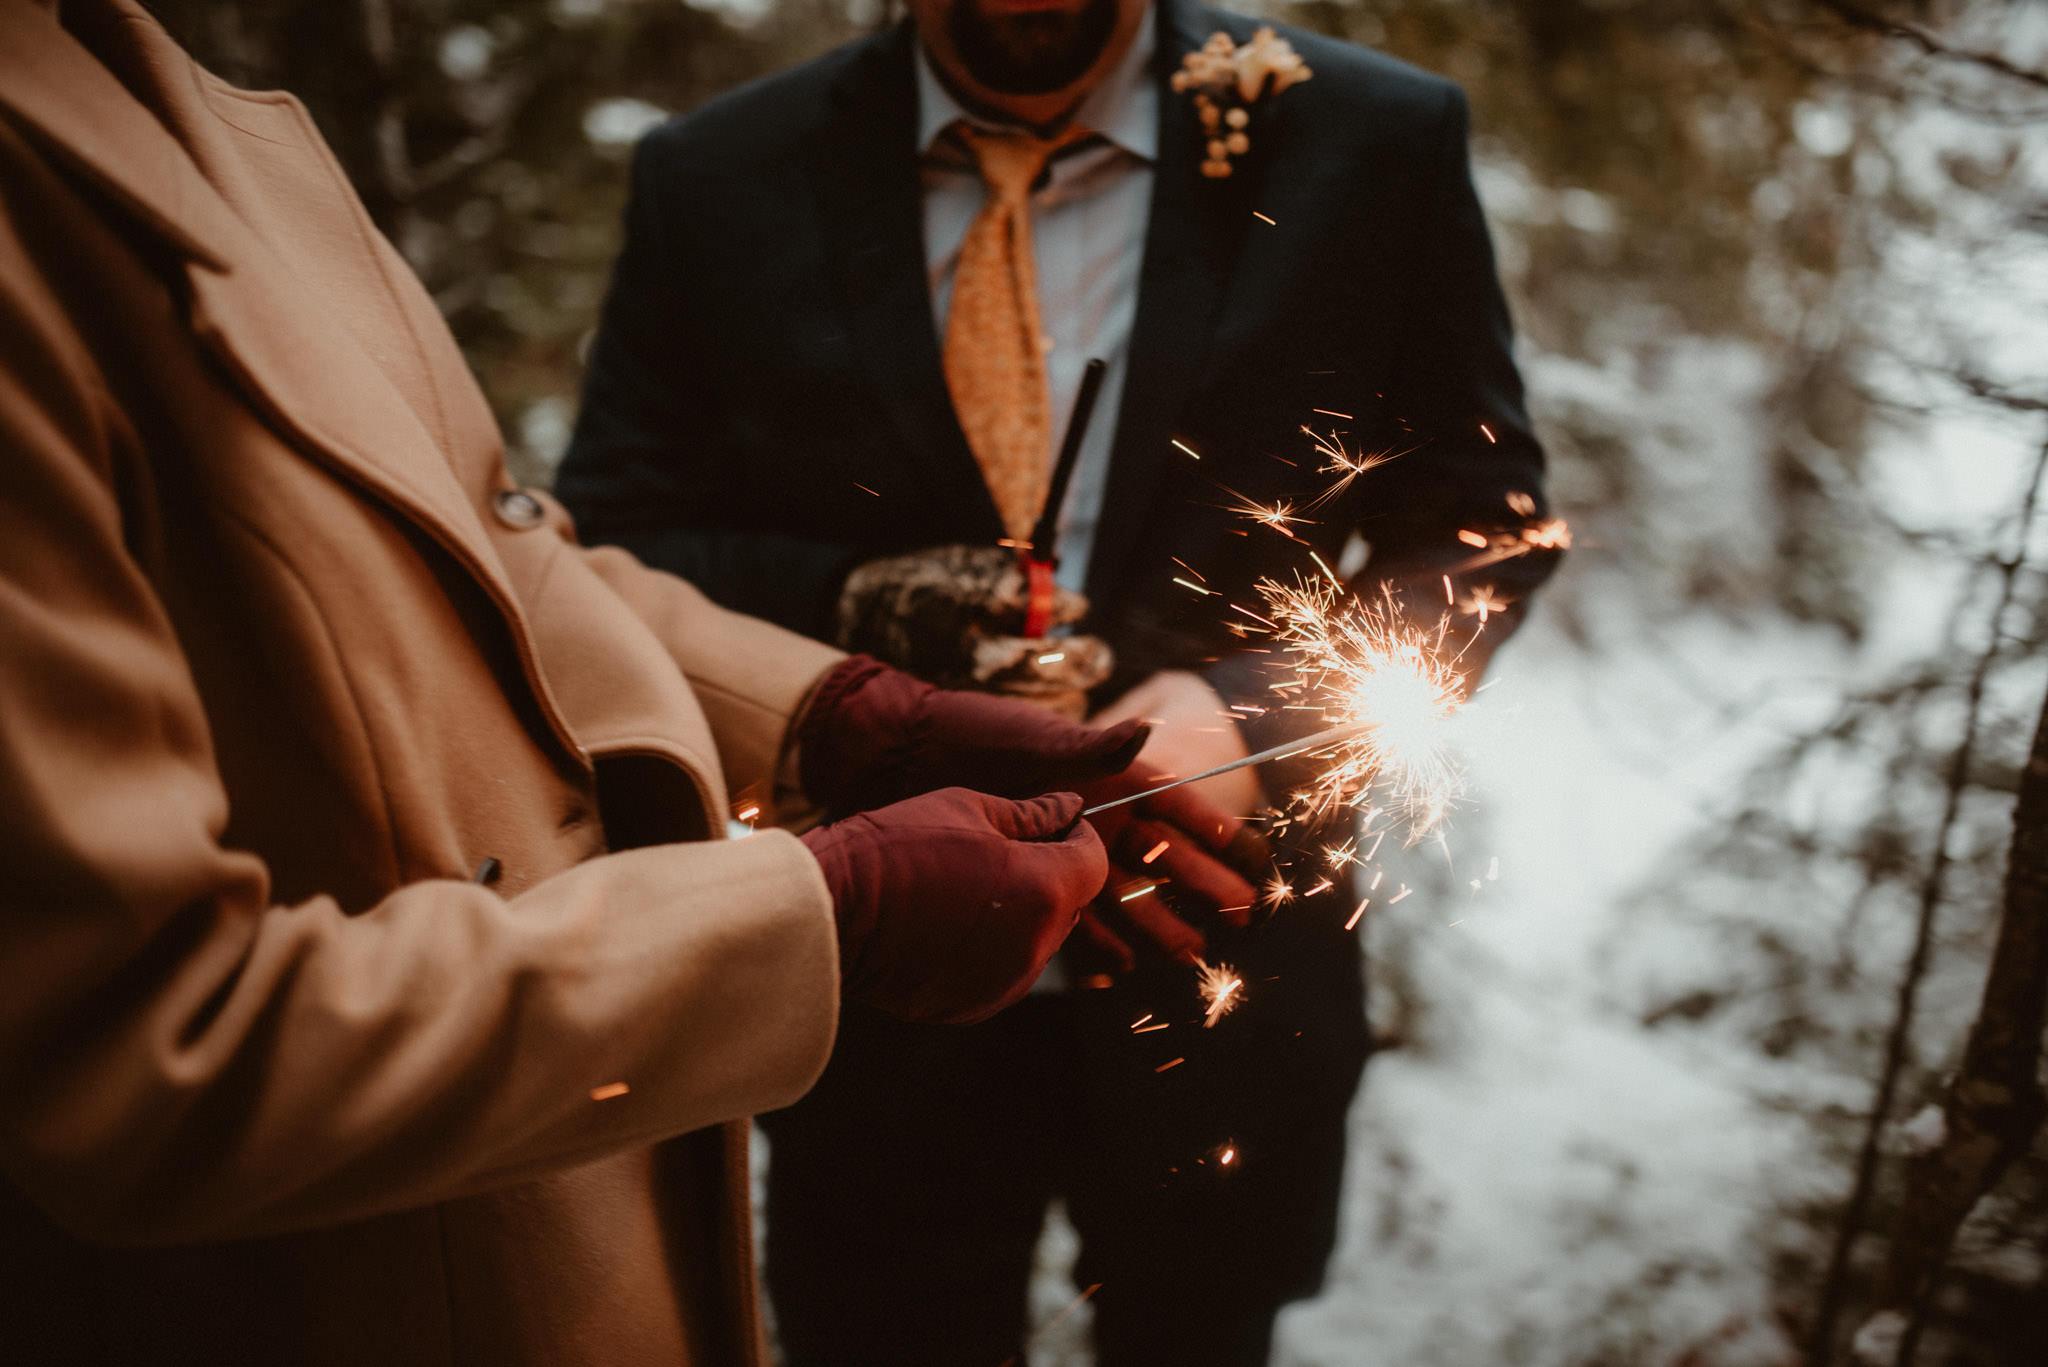 Sparkler photos at a winter elopement in Michigan